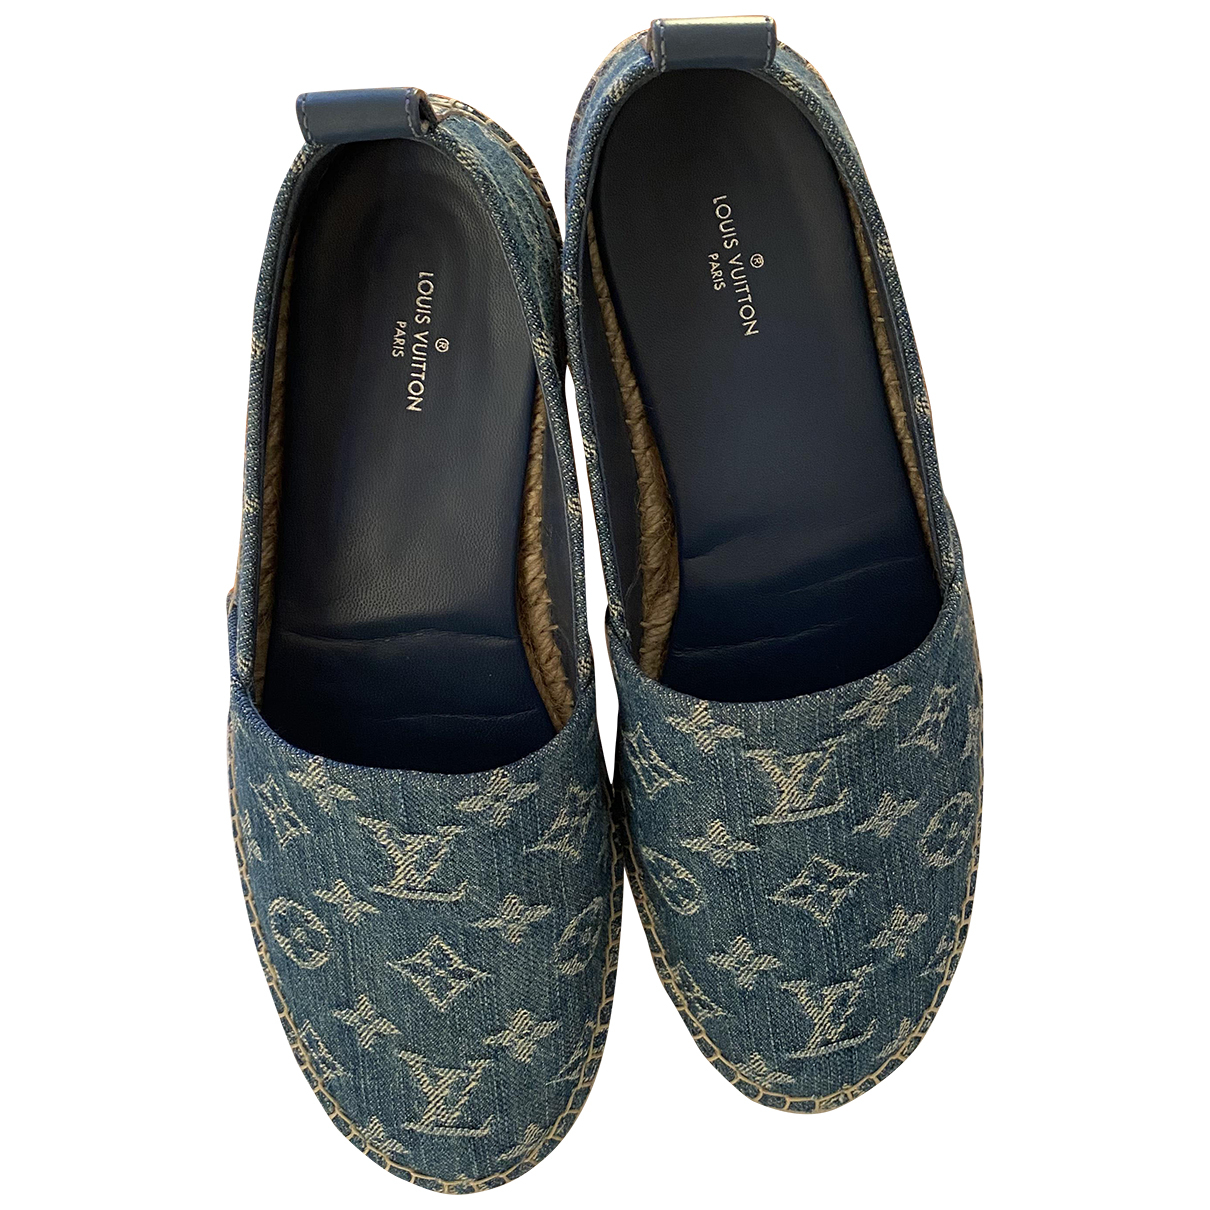 Alpargatas Louis Vuitton